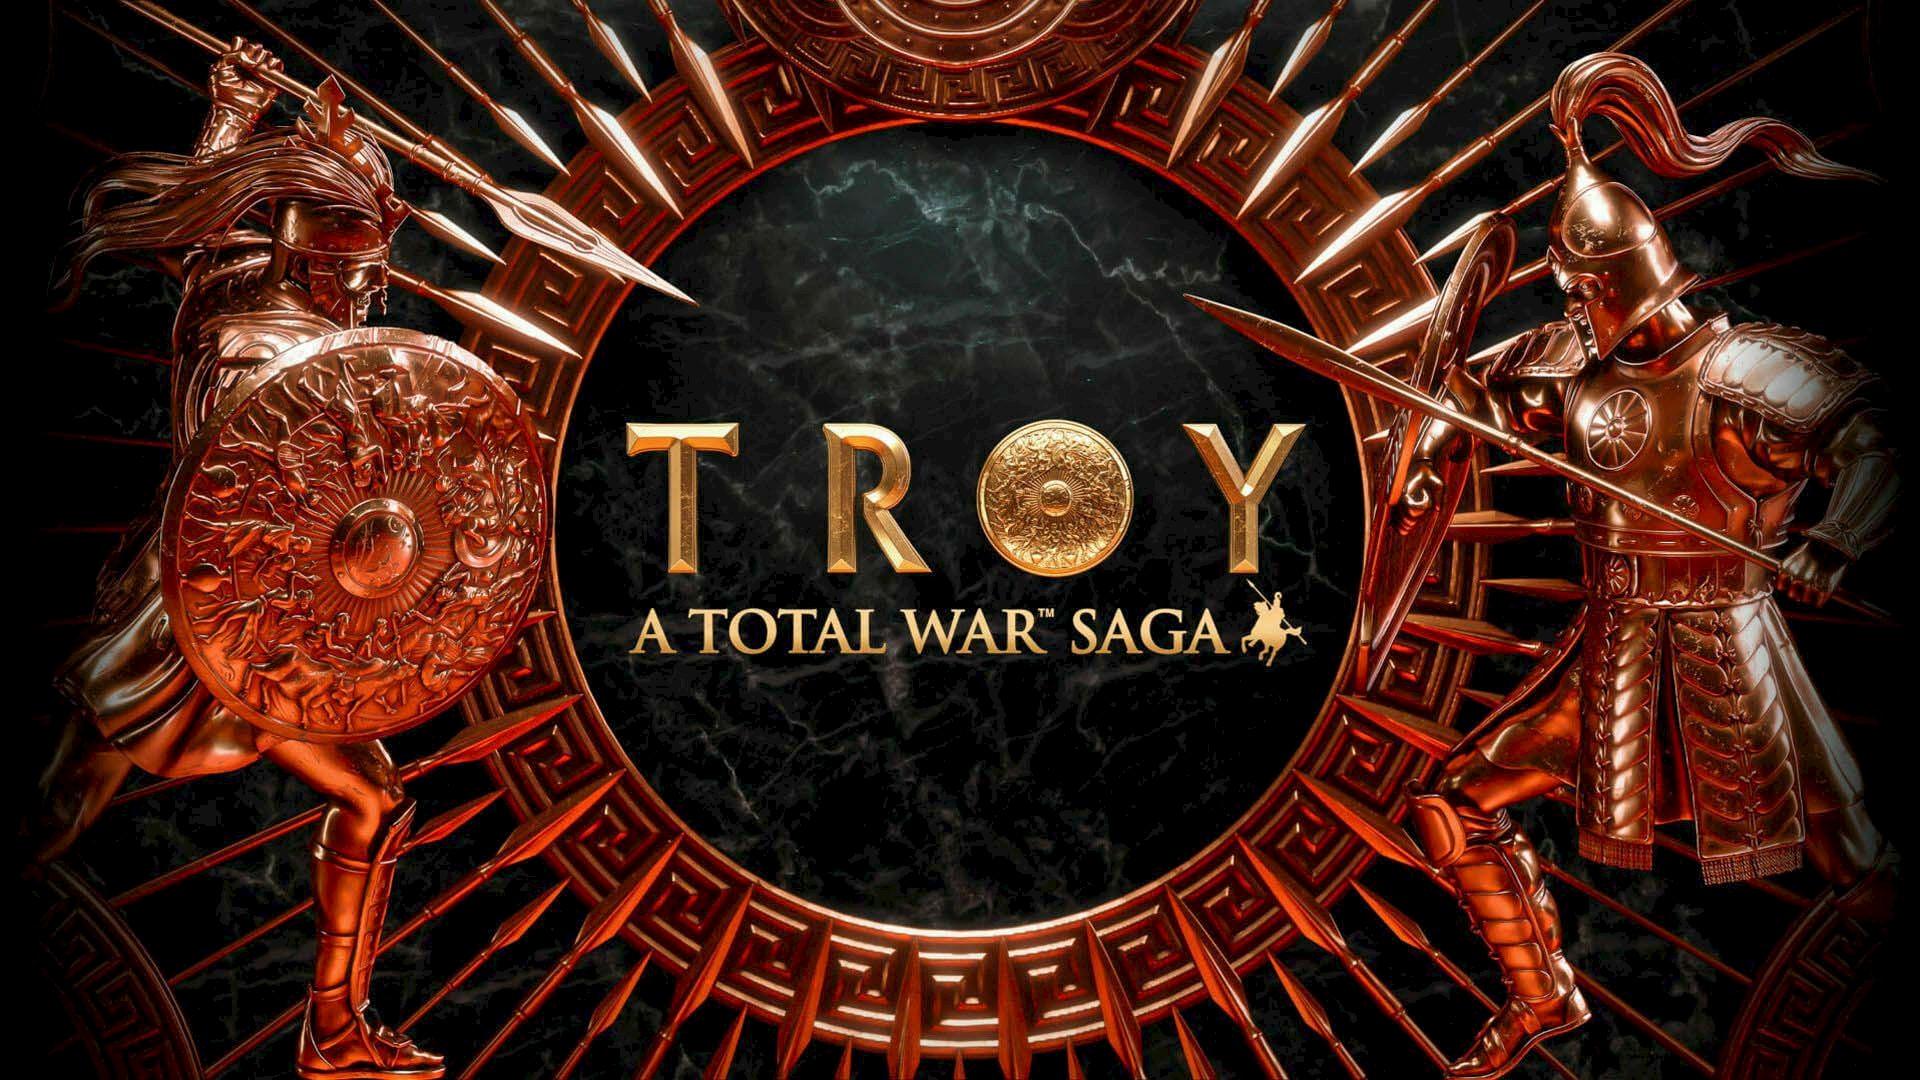 Постер Total War Saga: Troy